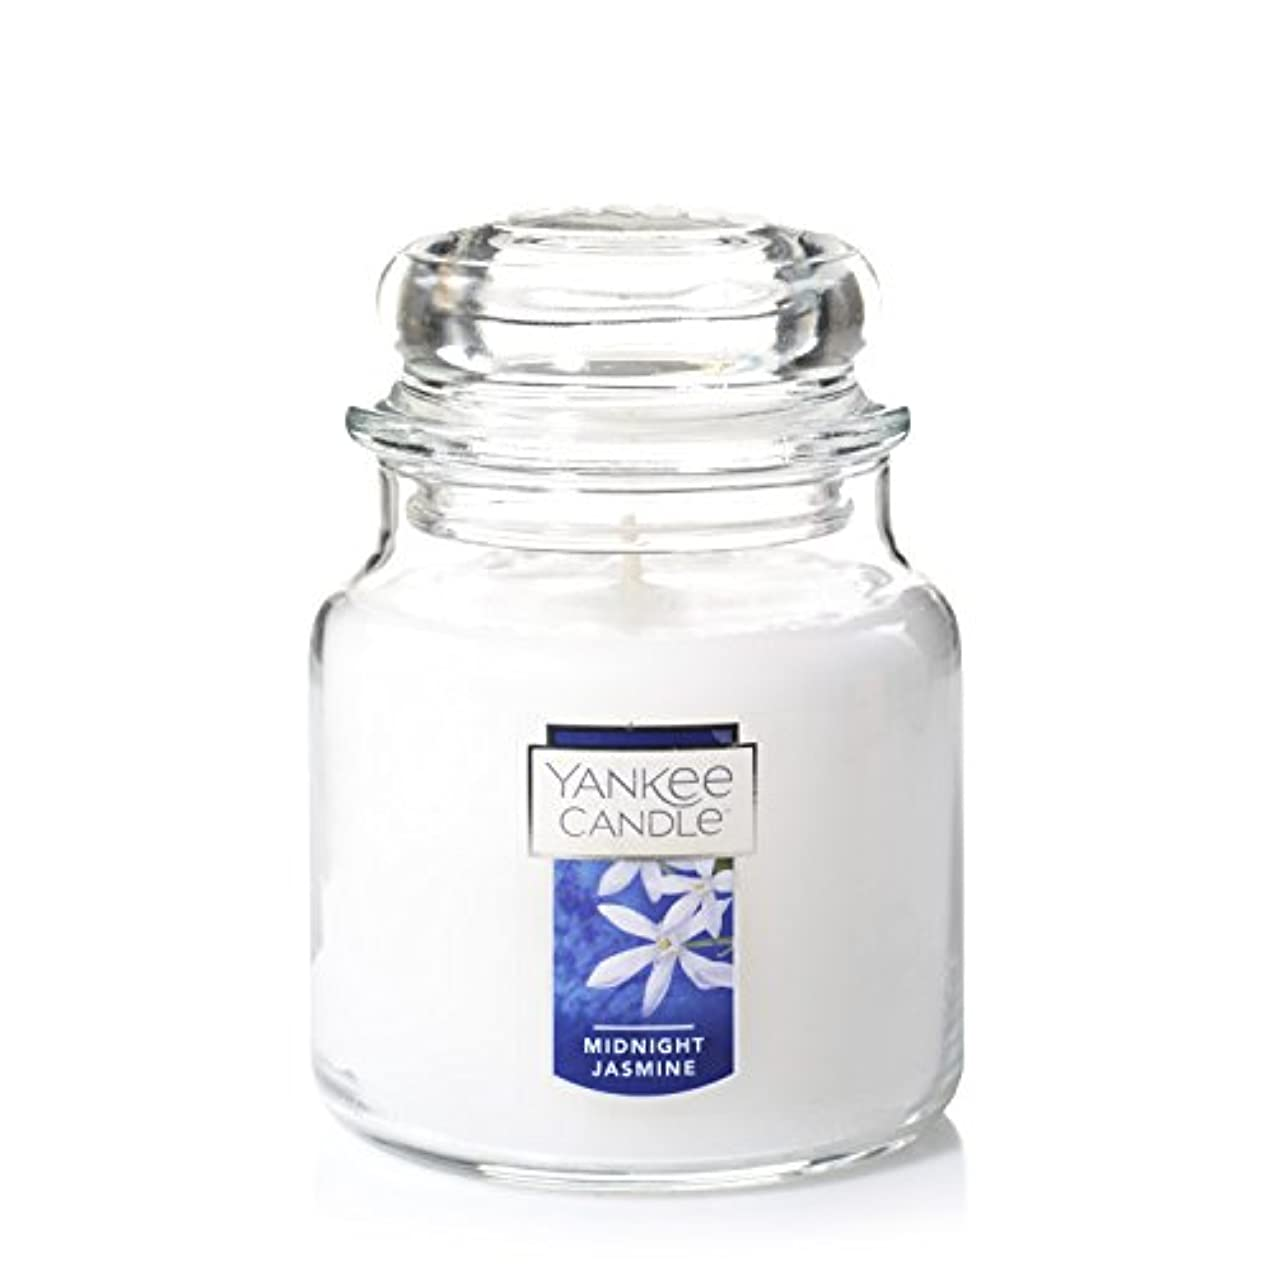 Yankee Candle Jar Candle、ミッドナイトジャスミン Medium Jar Candle 1129551z